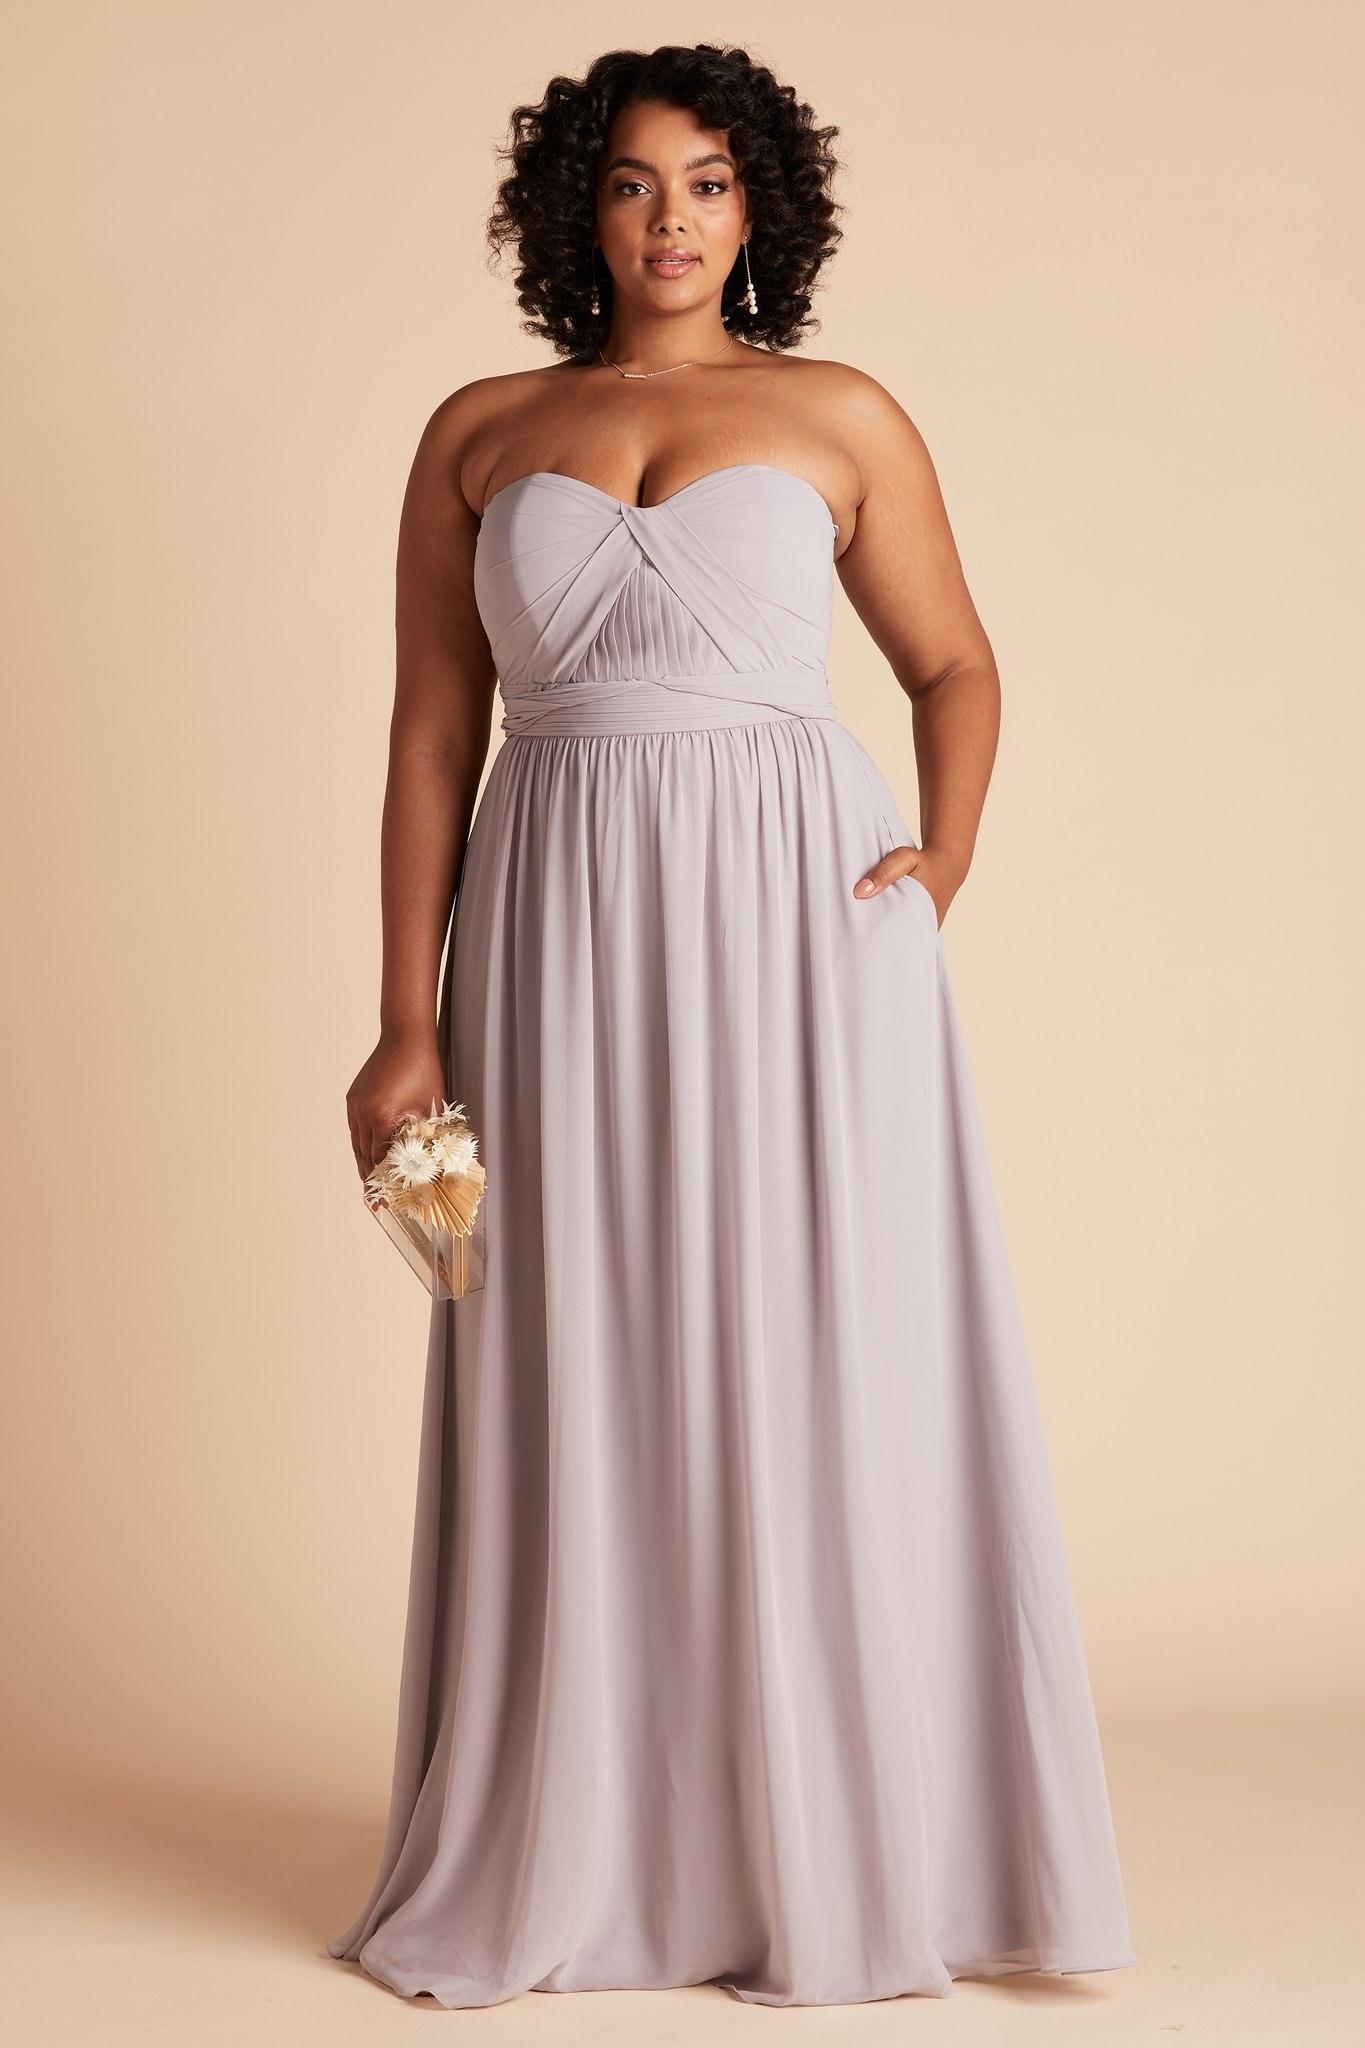 model wearing a lilac dress